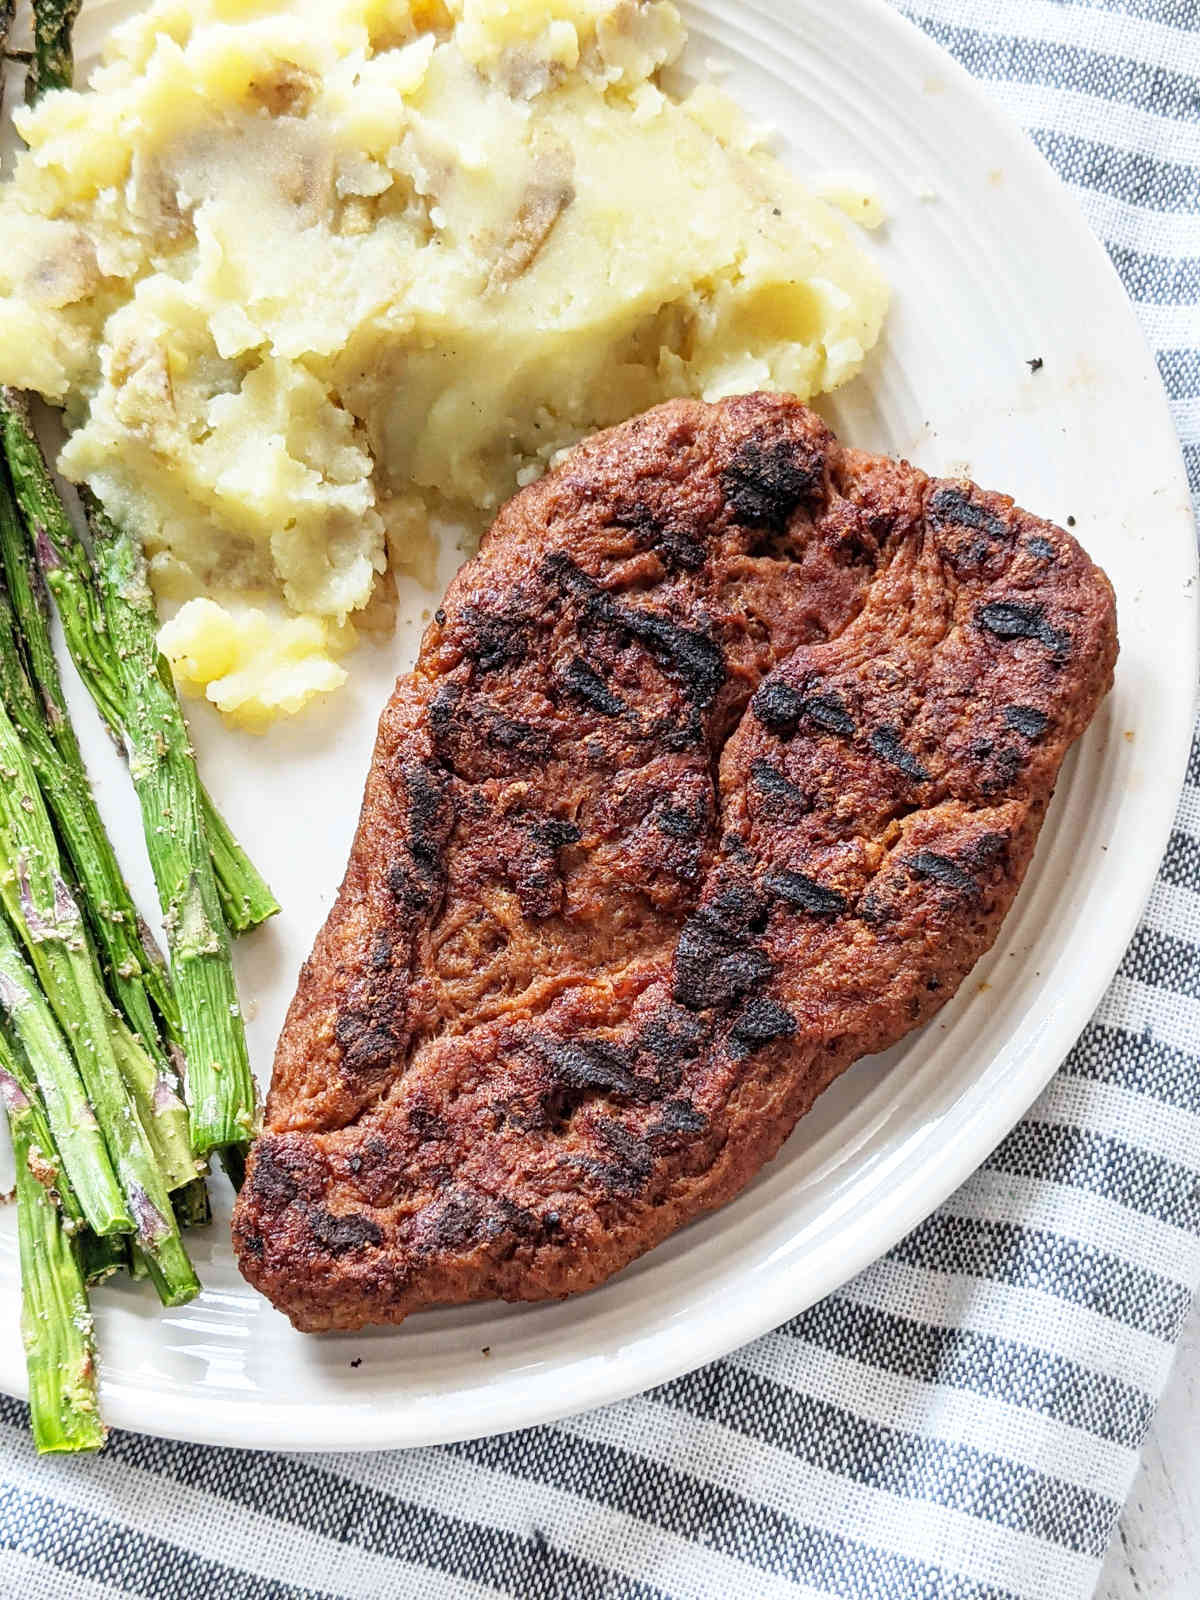 Vegan steak on a plate up close